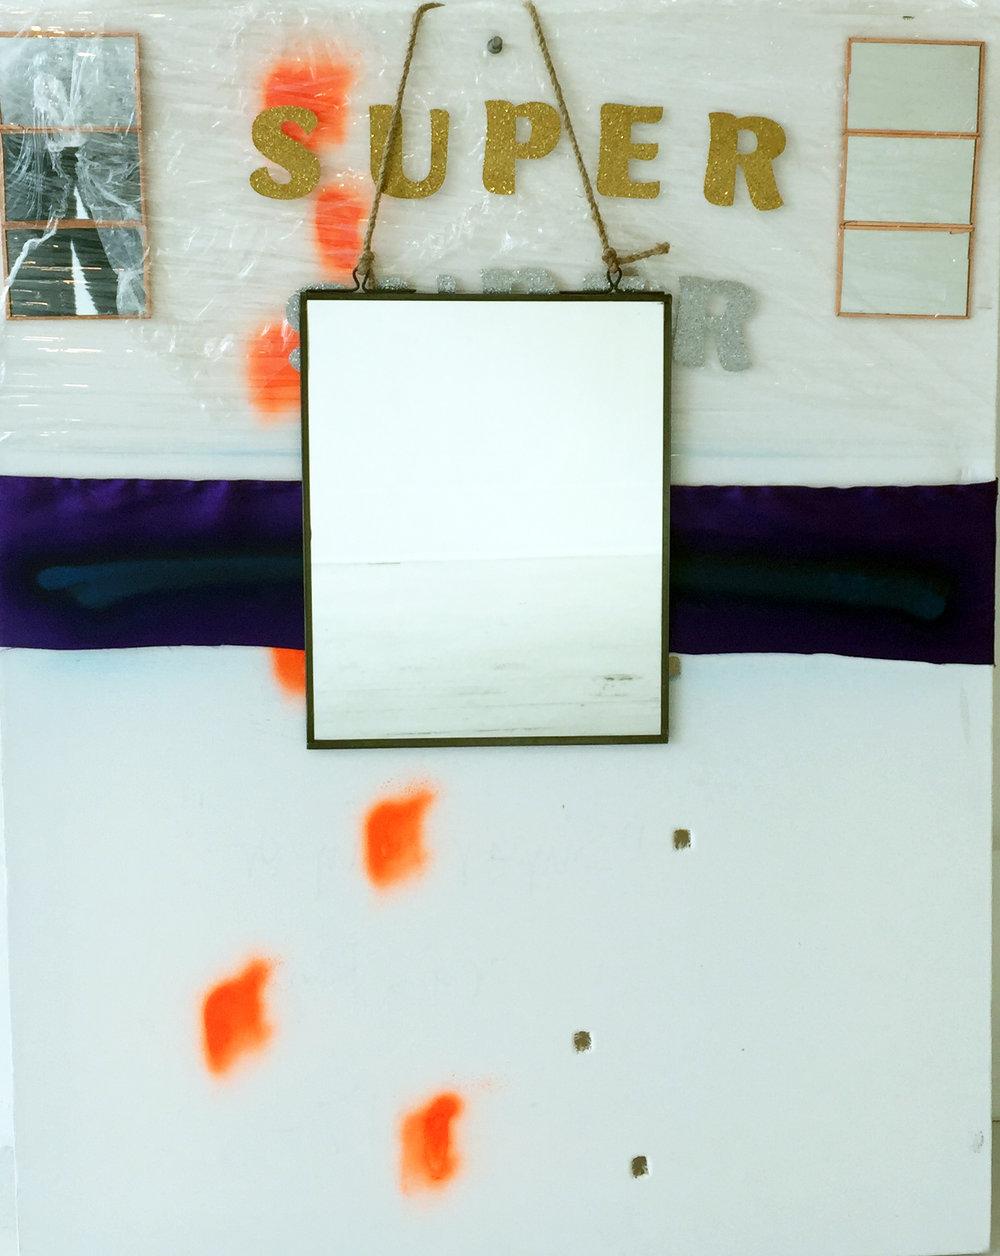 Craig Roper,  Super Super , 2017, mixed media, 28 x 22 inches, photo credit: Jared Kennedy